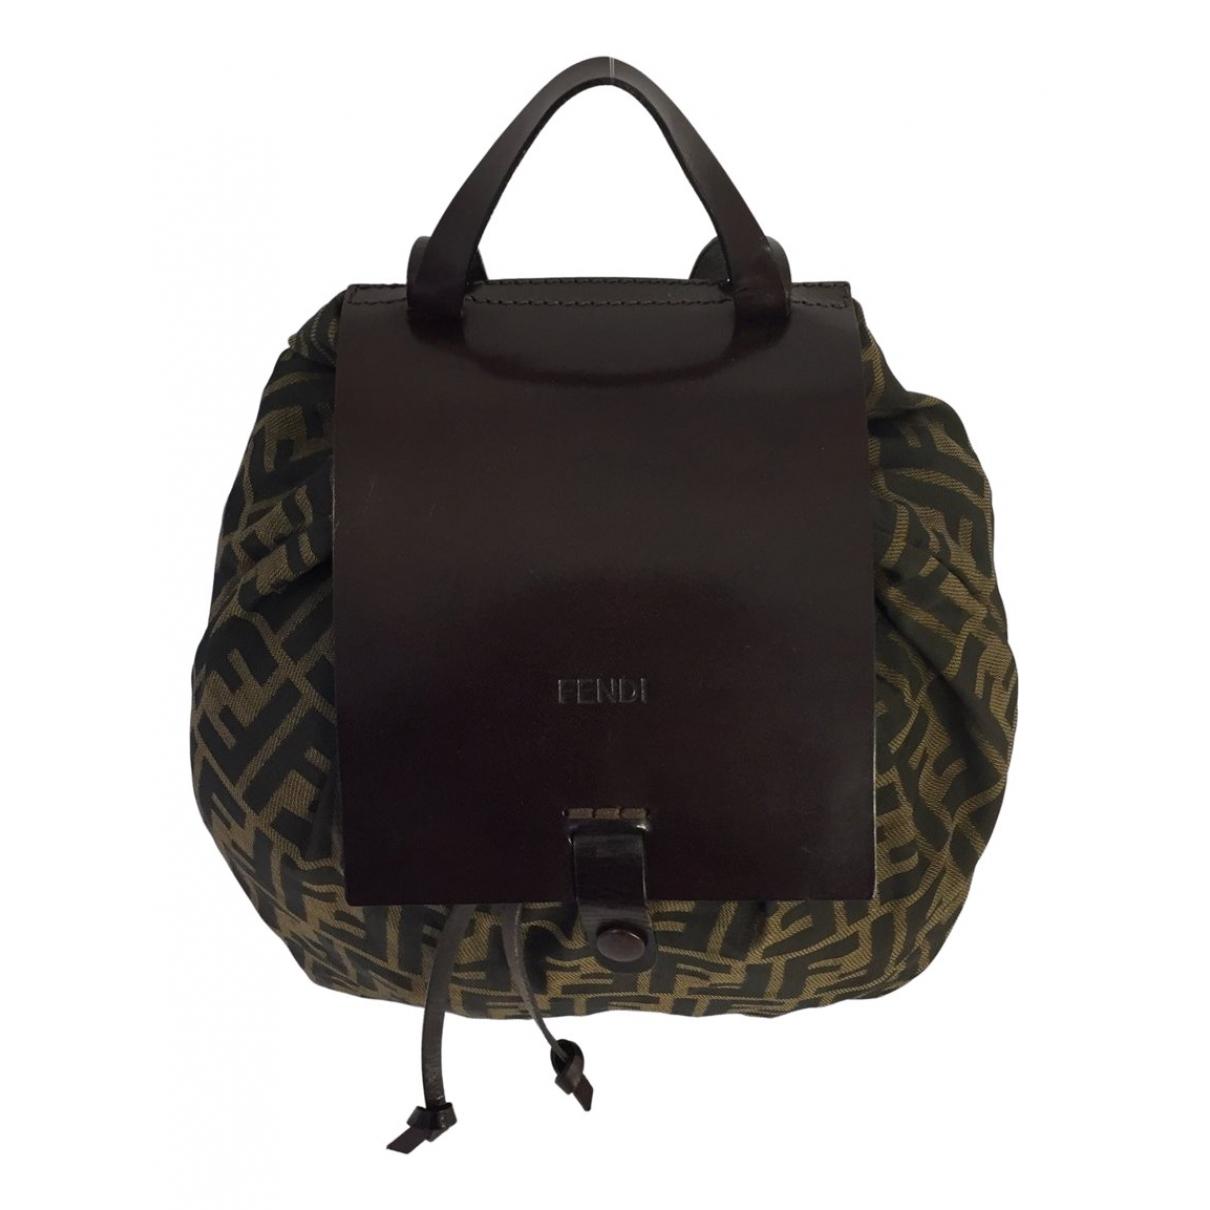 Fendi N Brown Cloth backpack for Women N